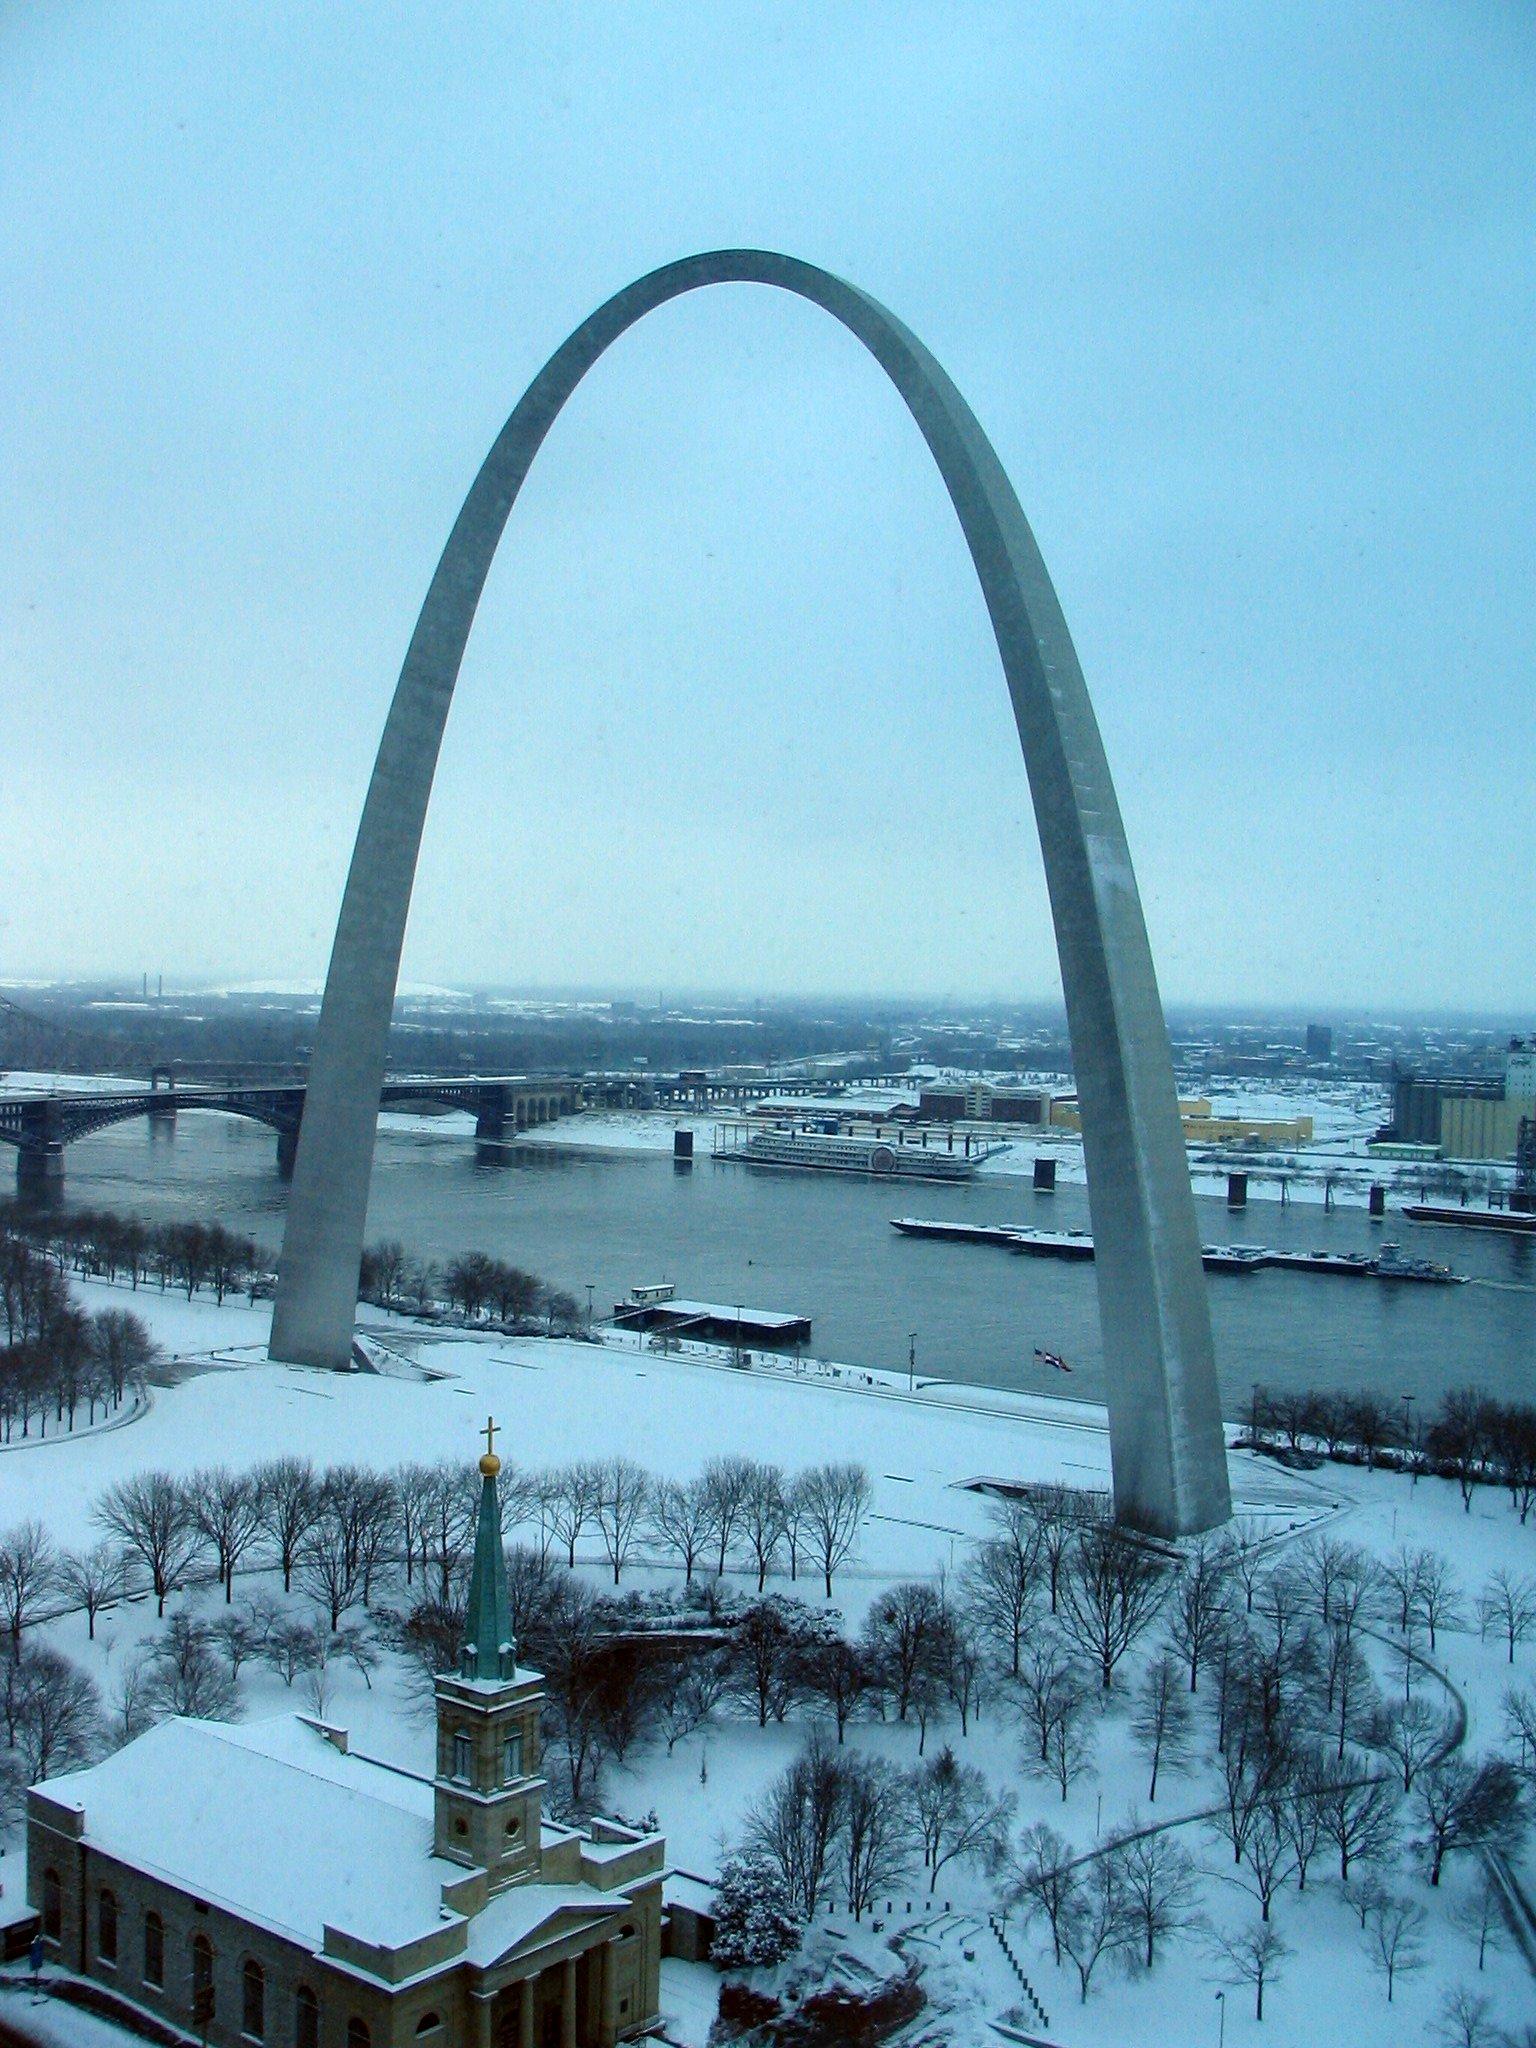 Arch - snow - 9 am.jpg